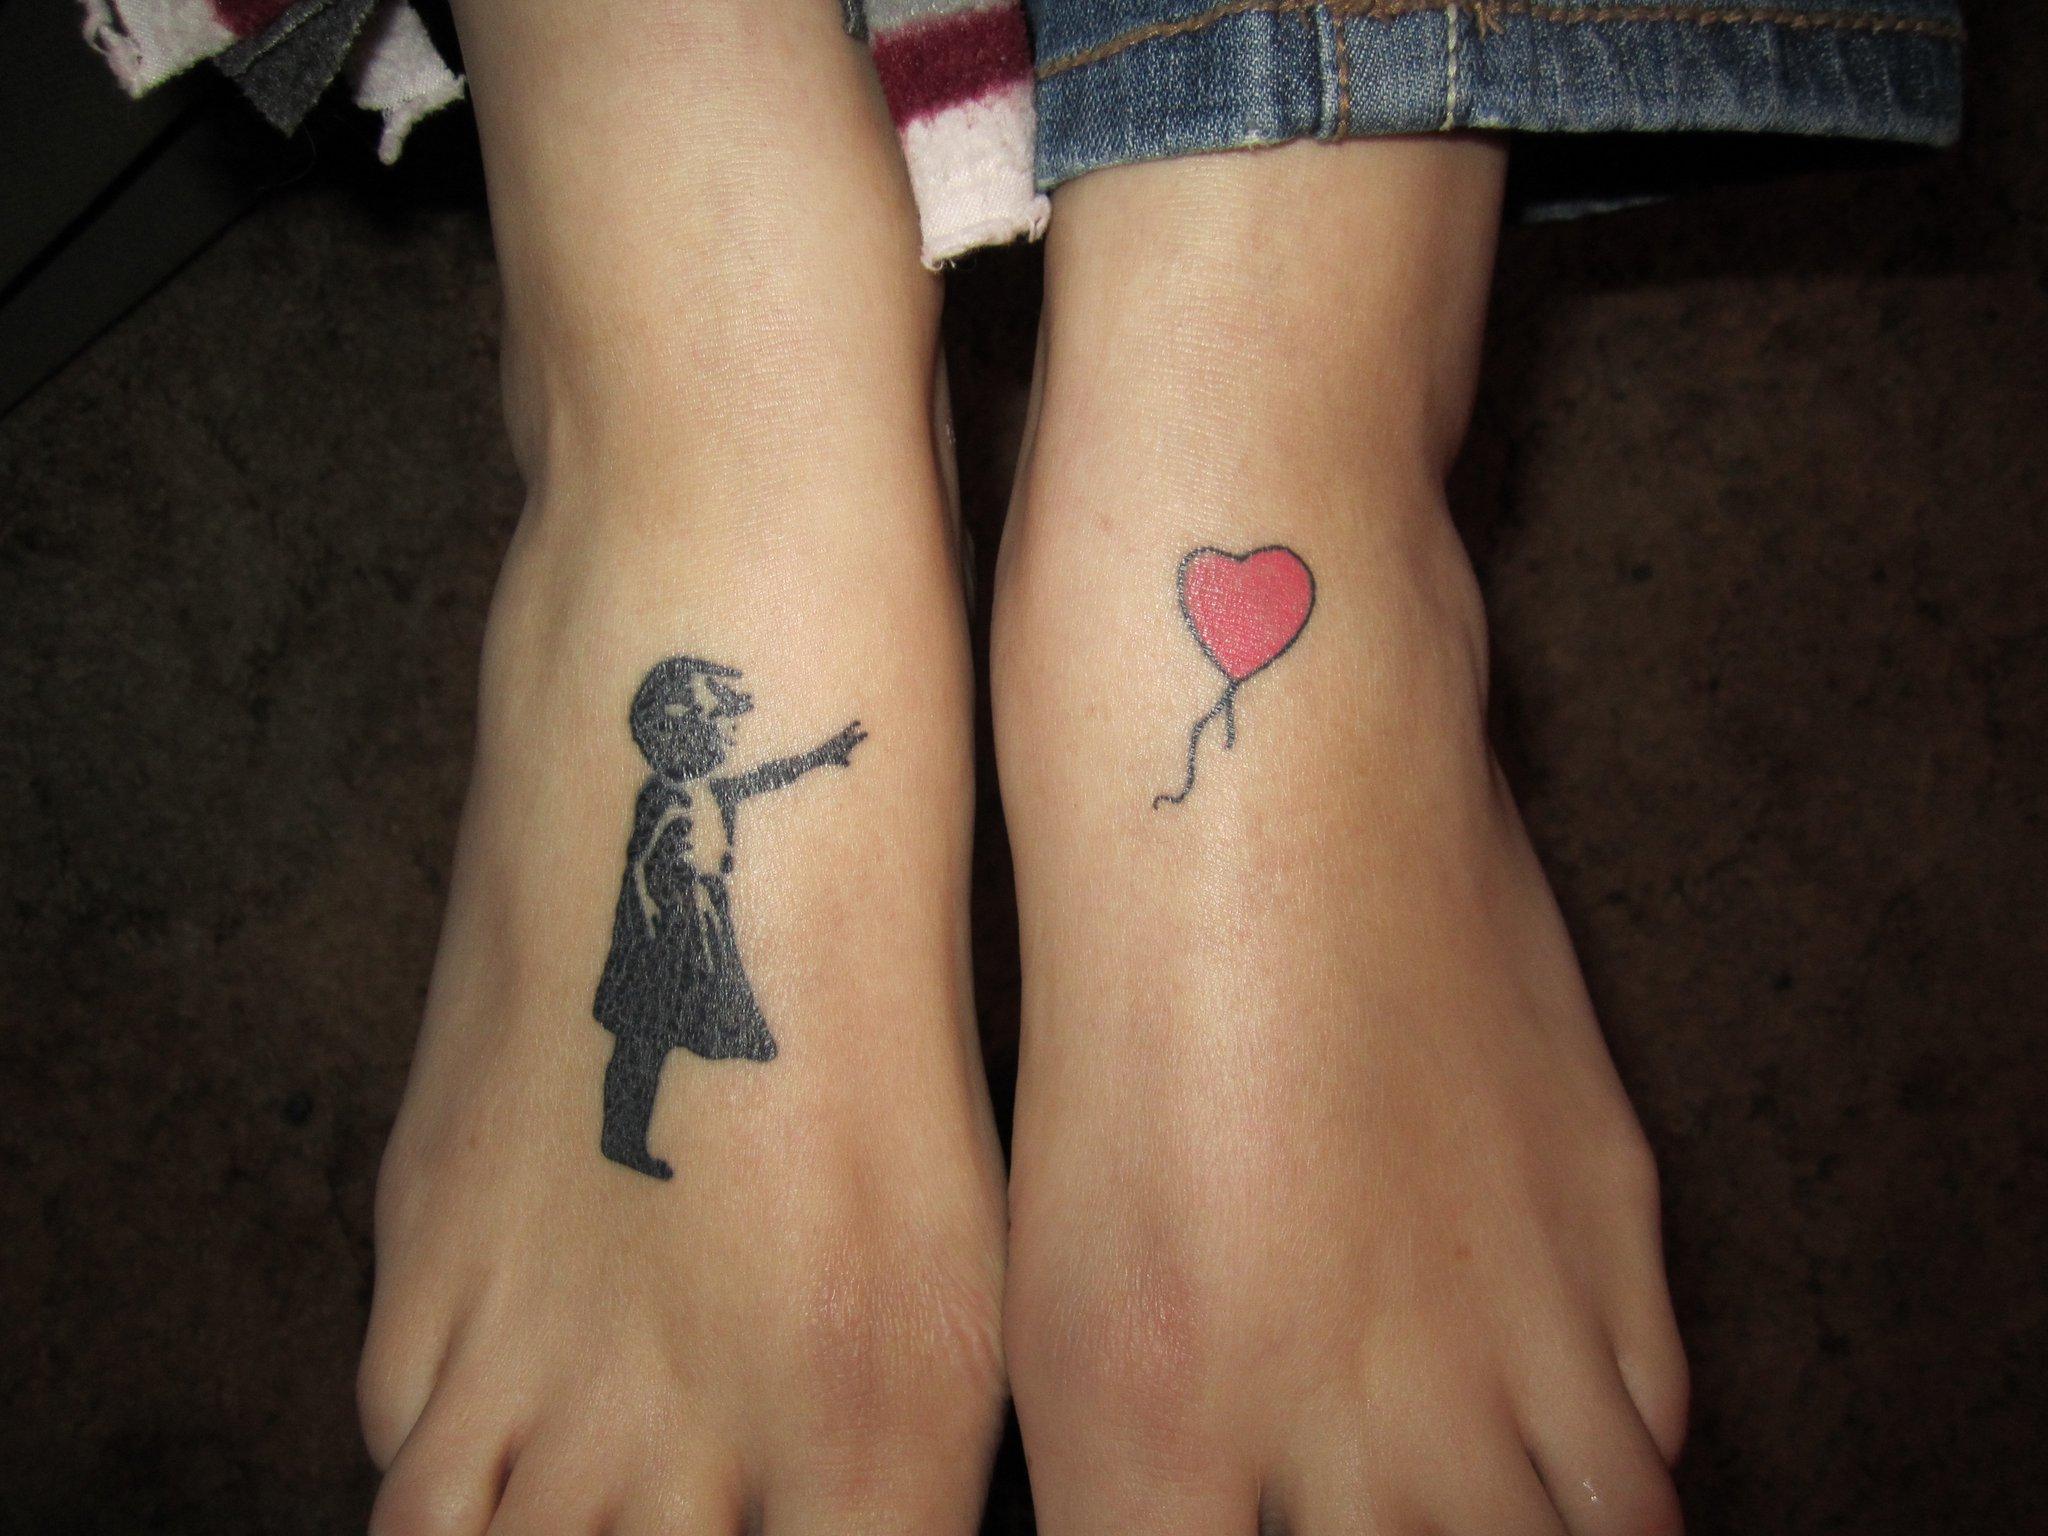 awesome tattoo